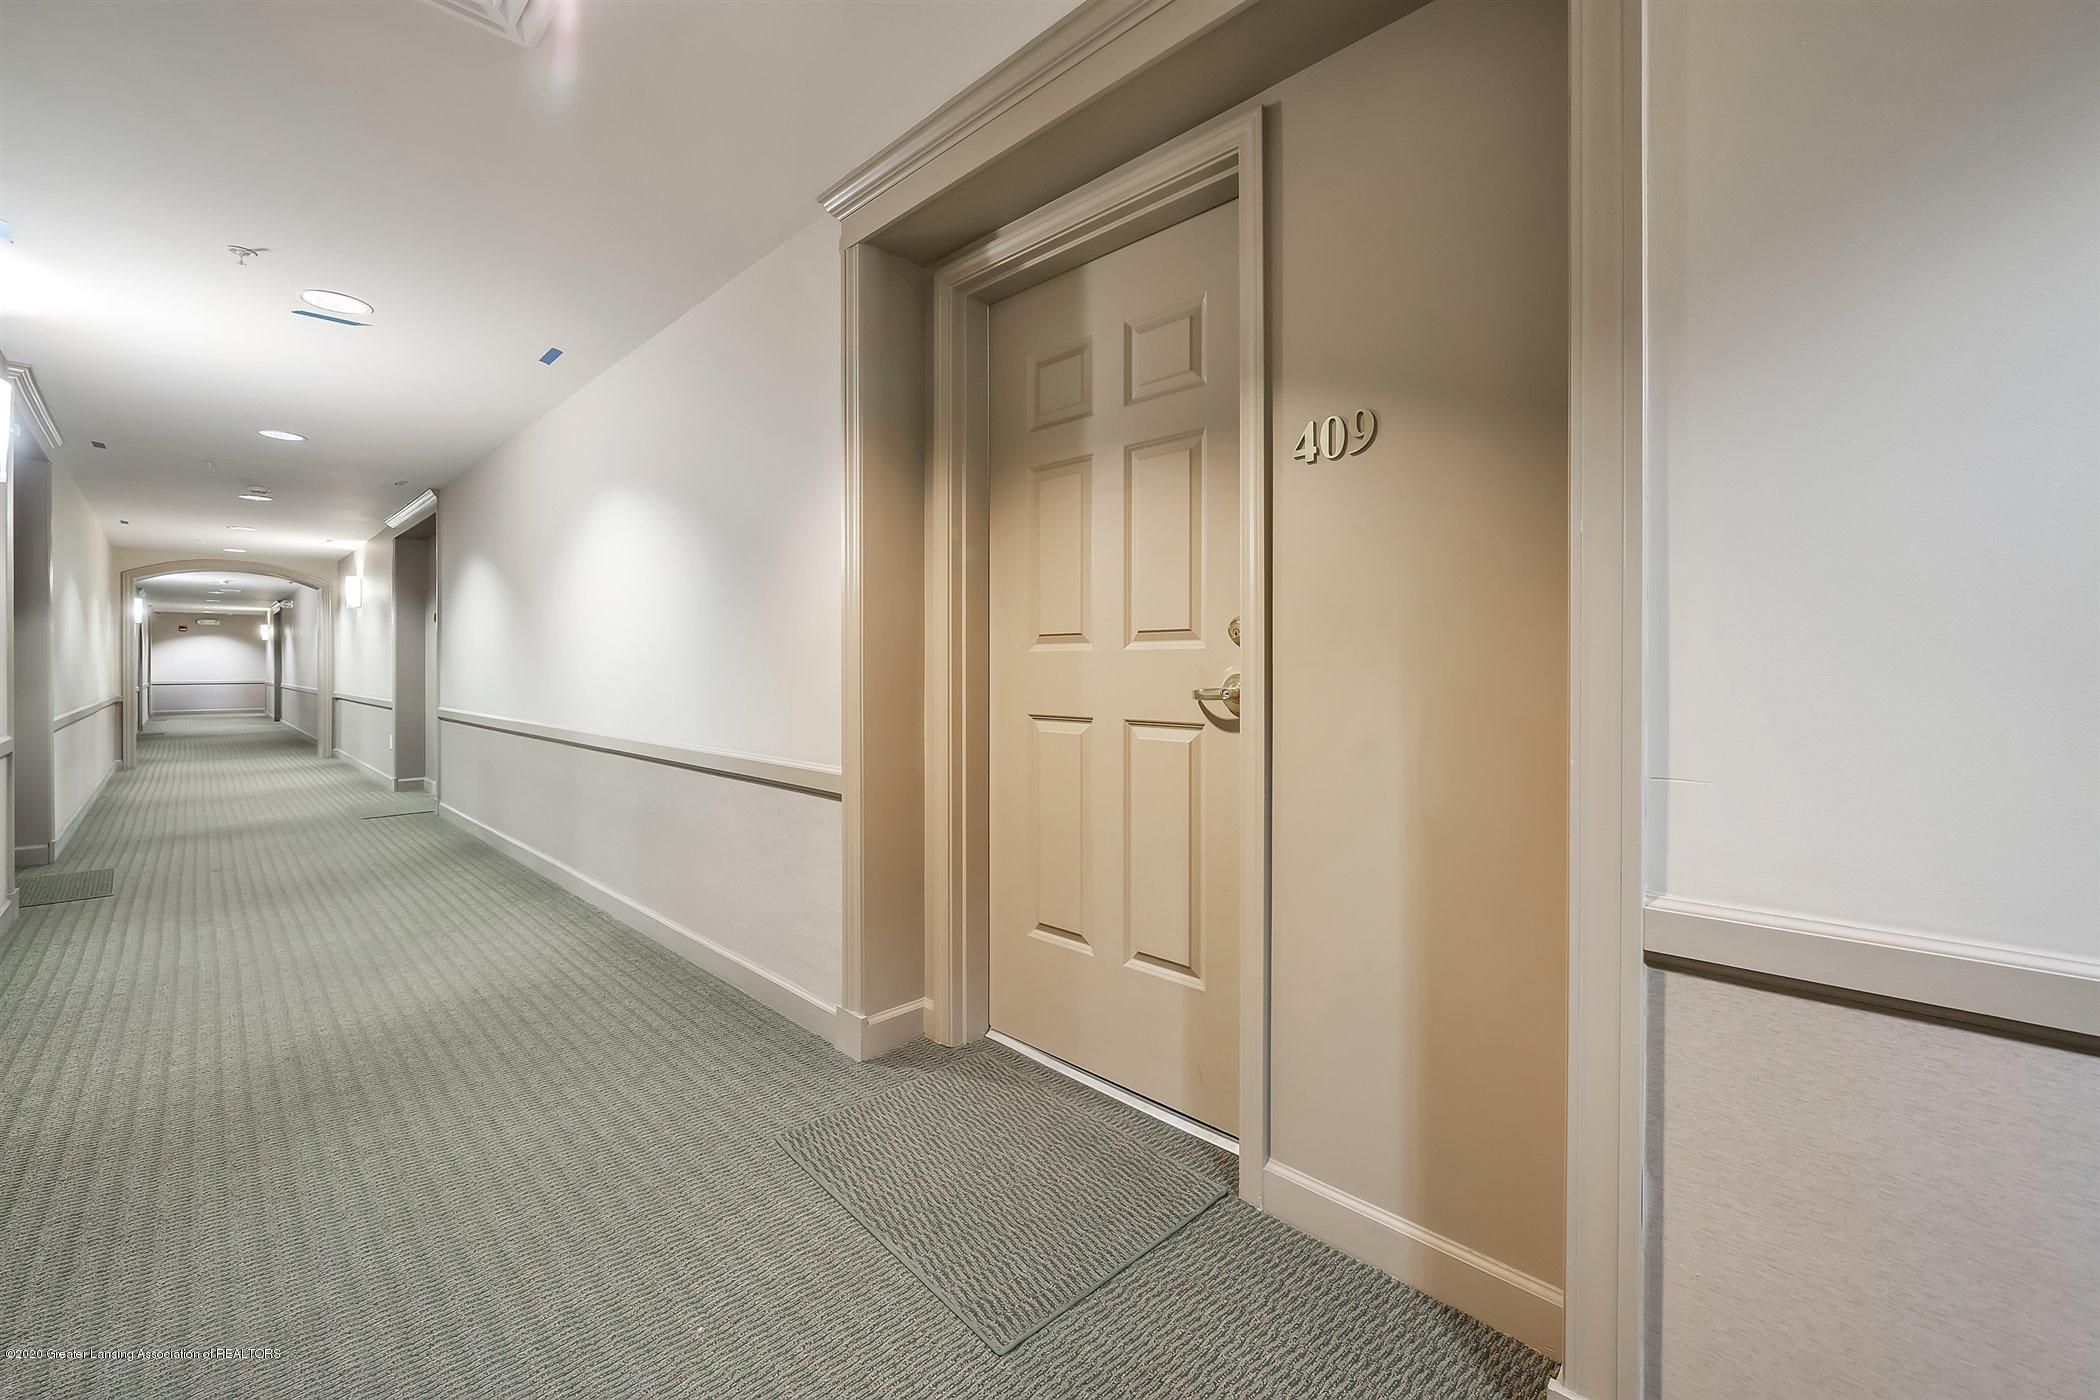 220 M. A. C. Ave Apt 409 - HALLWAY Entrance - 6